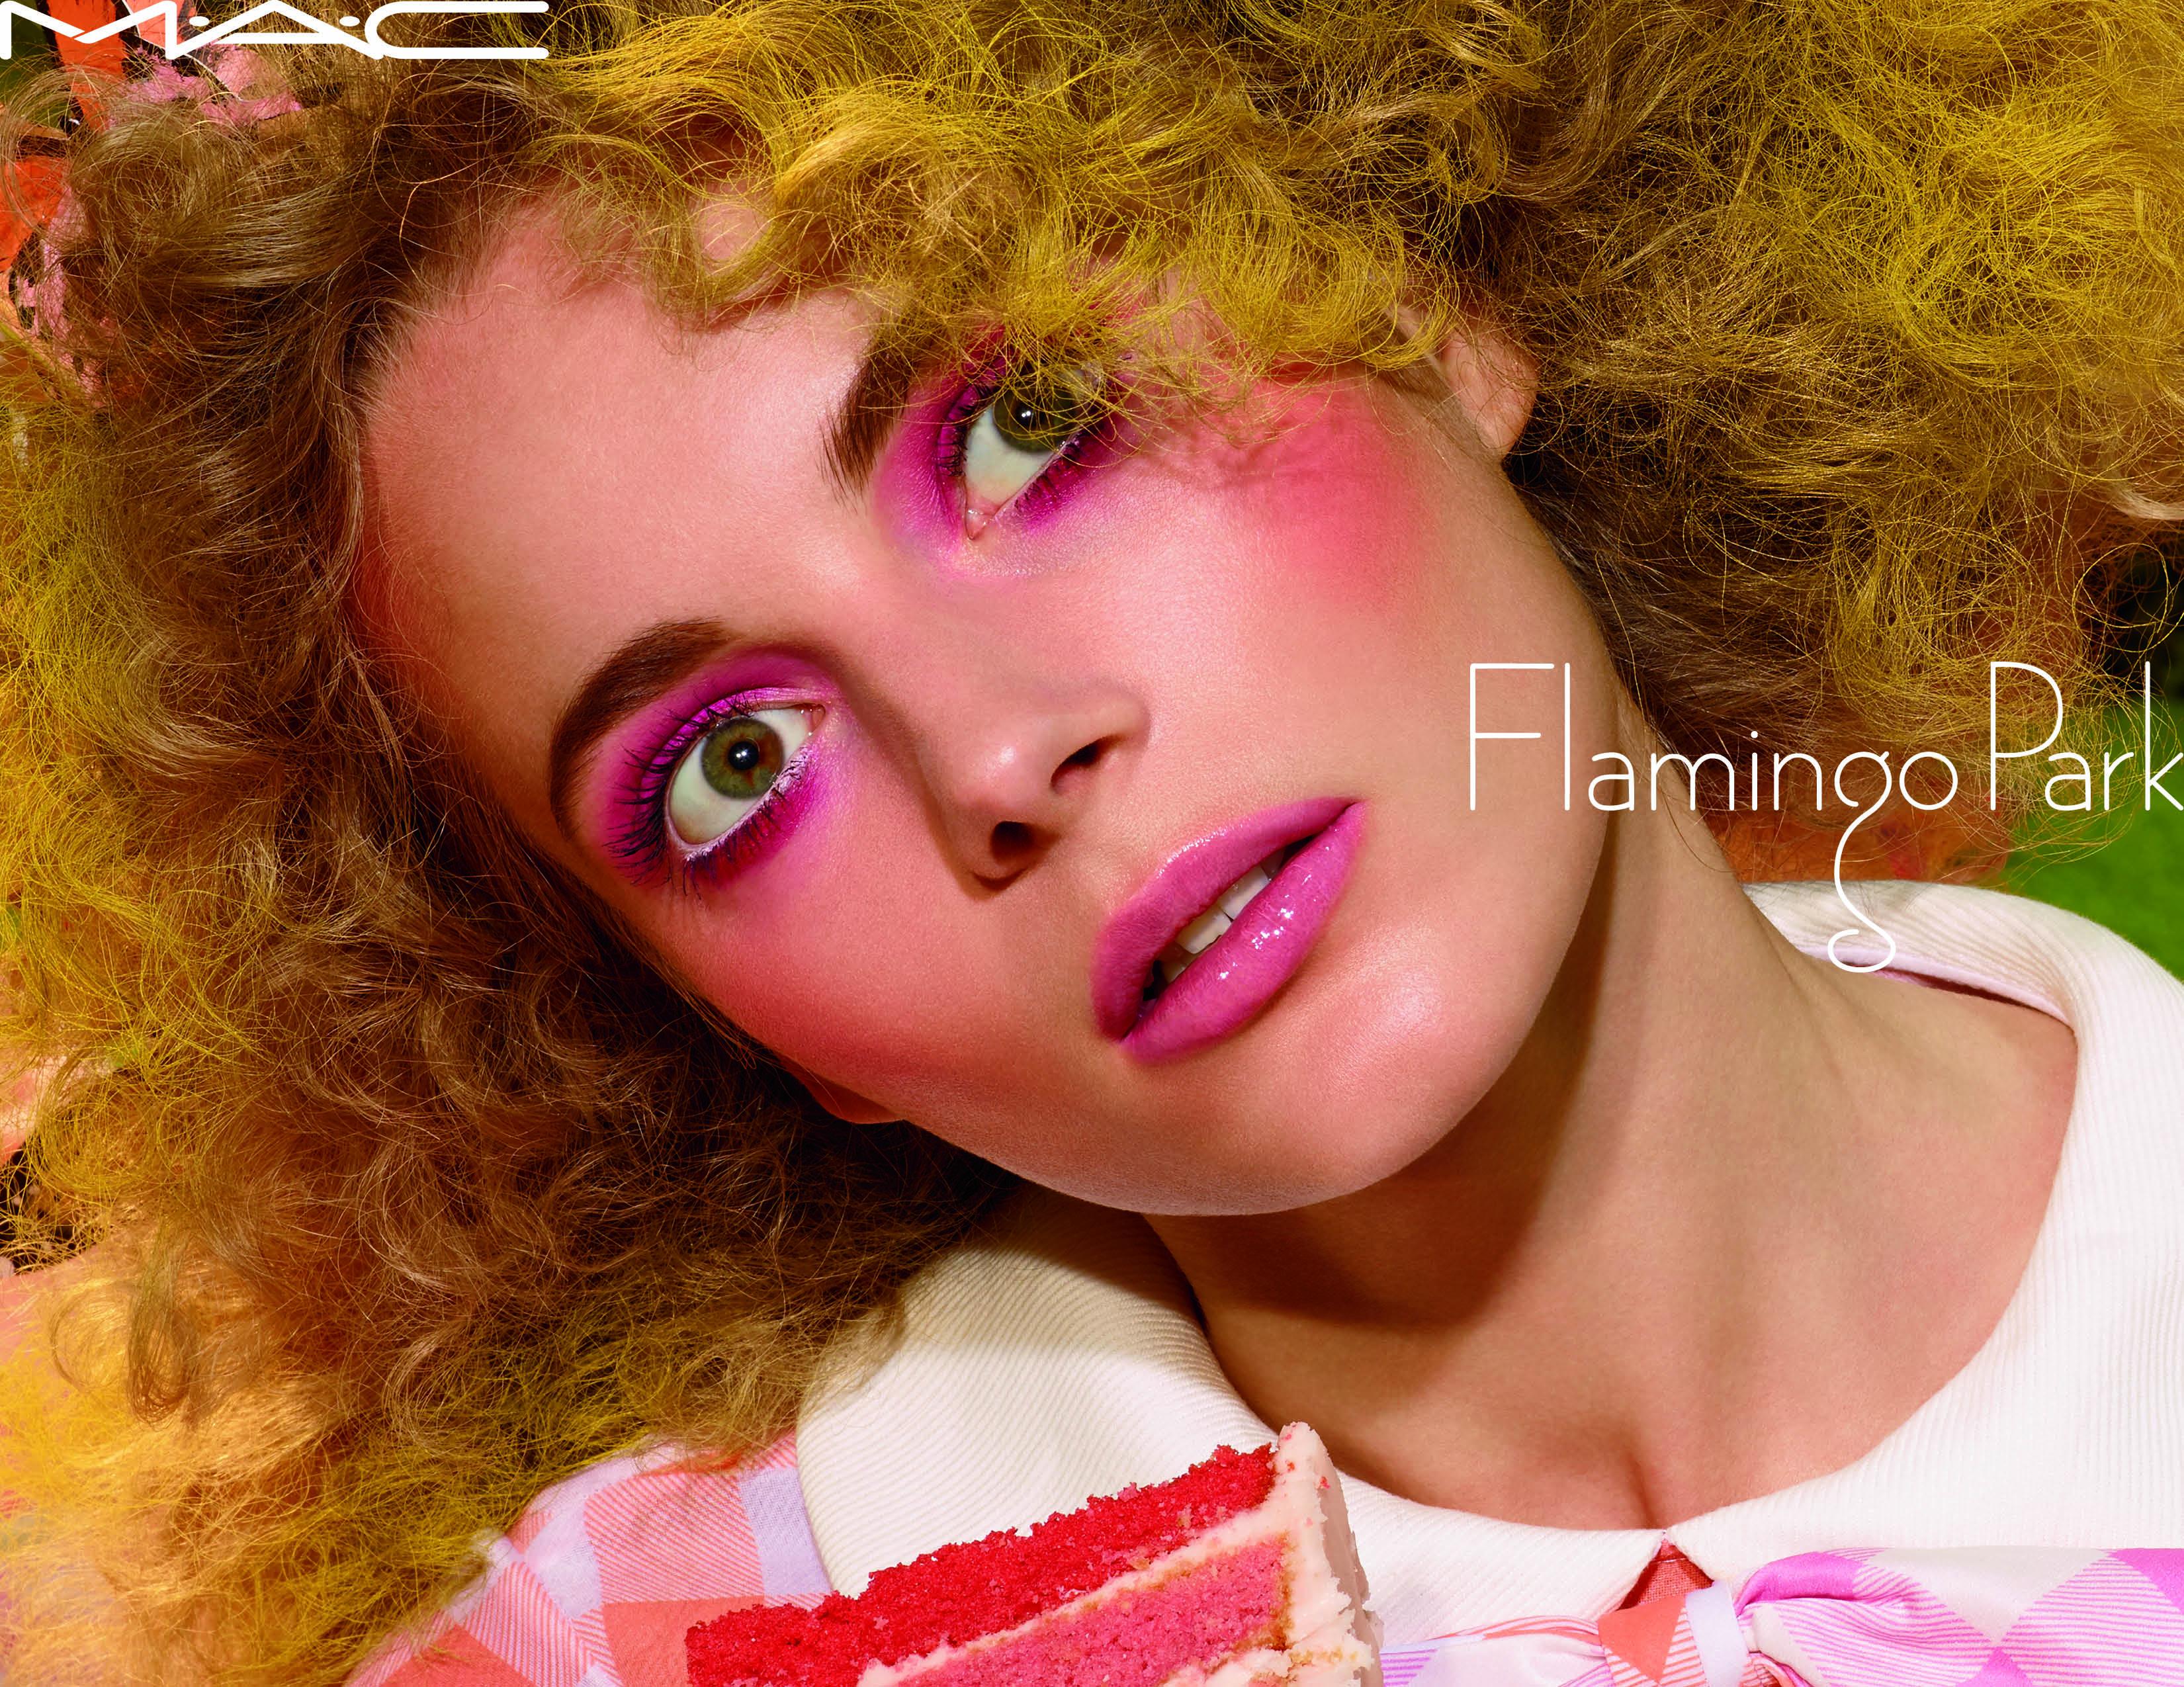 flamingo_park_beauty_3002.jpg